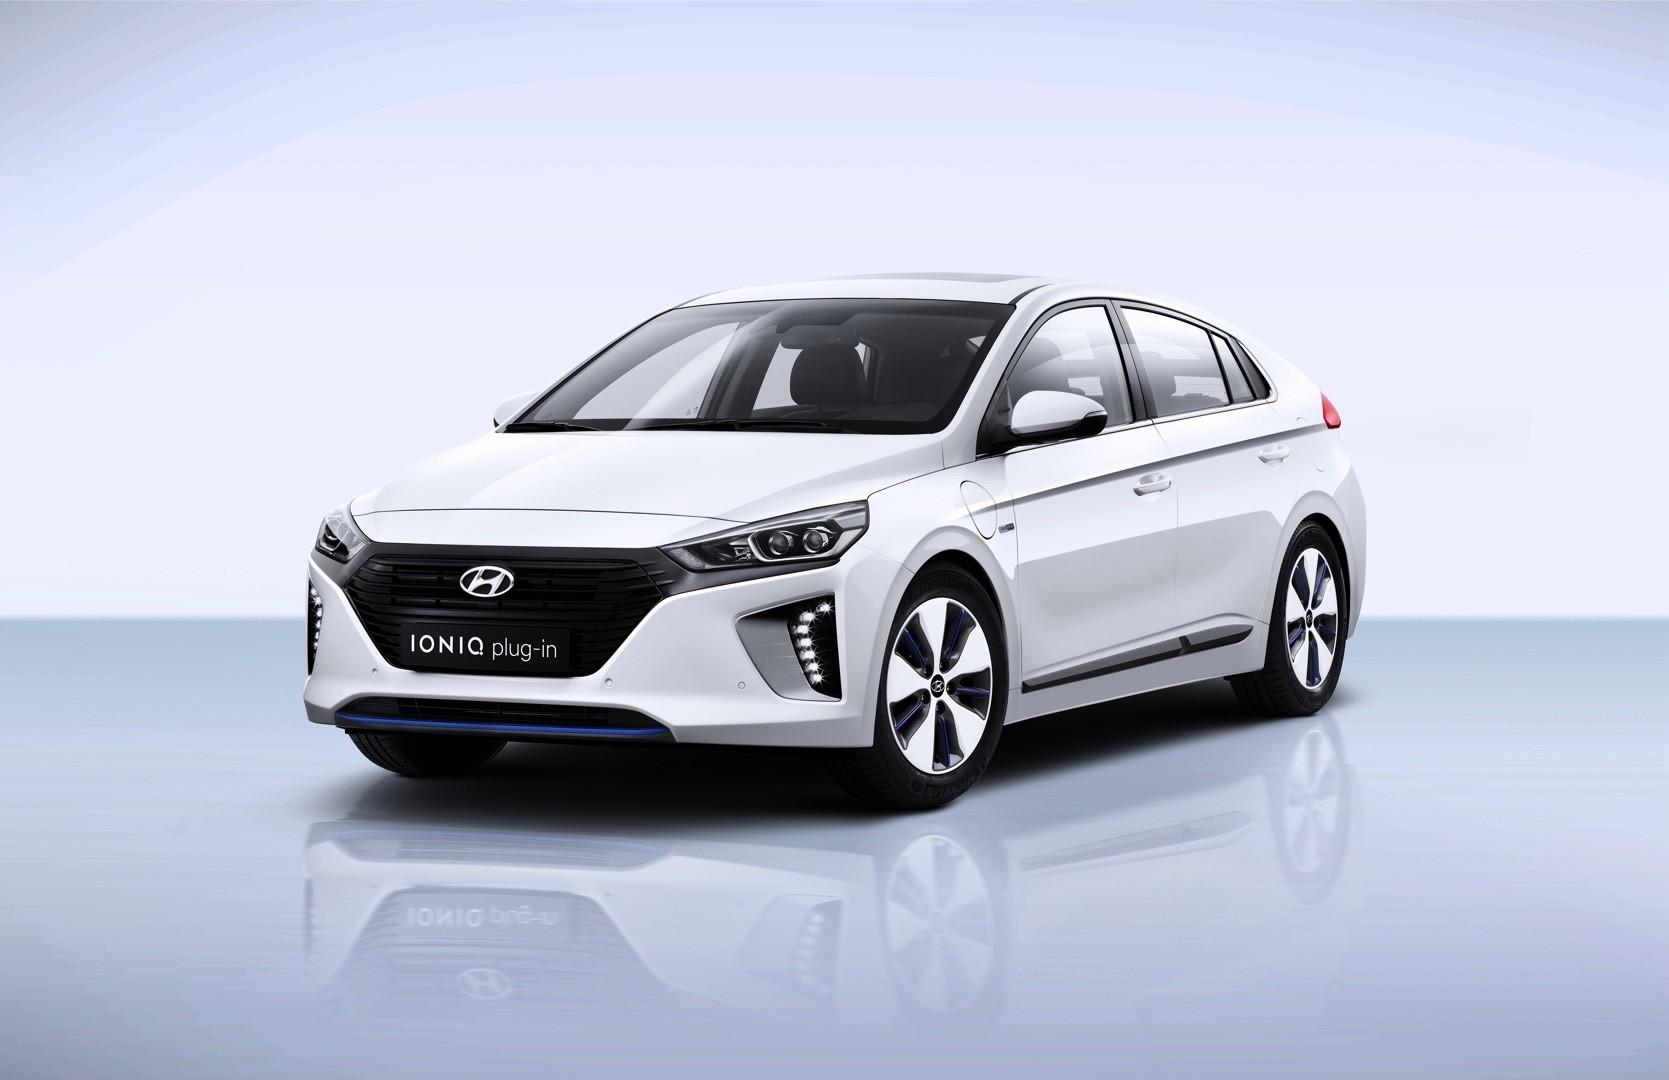 ioniq hyundai toyota bmw chevrolet i3 prius bolt beats economy fuel wars hybrid autoevolution money plug